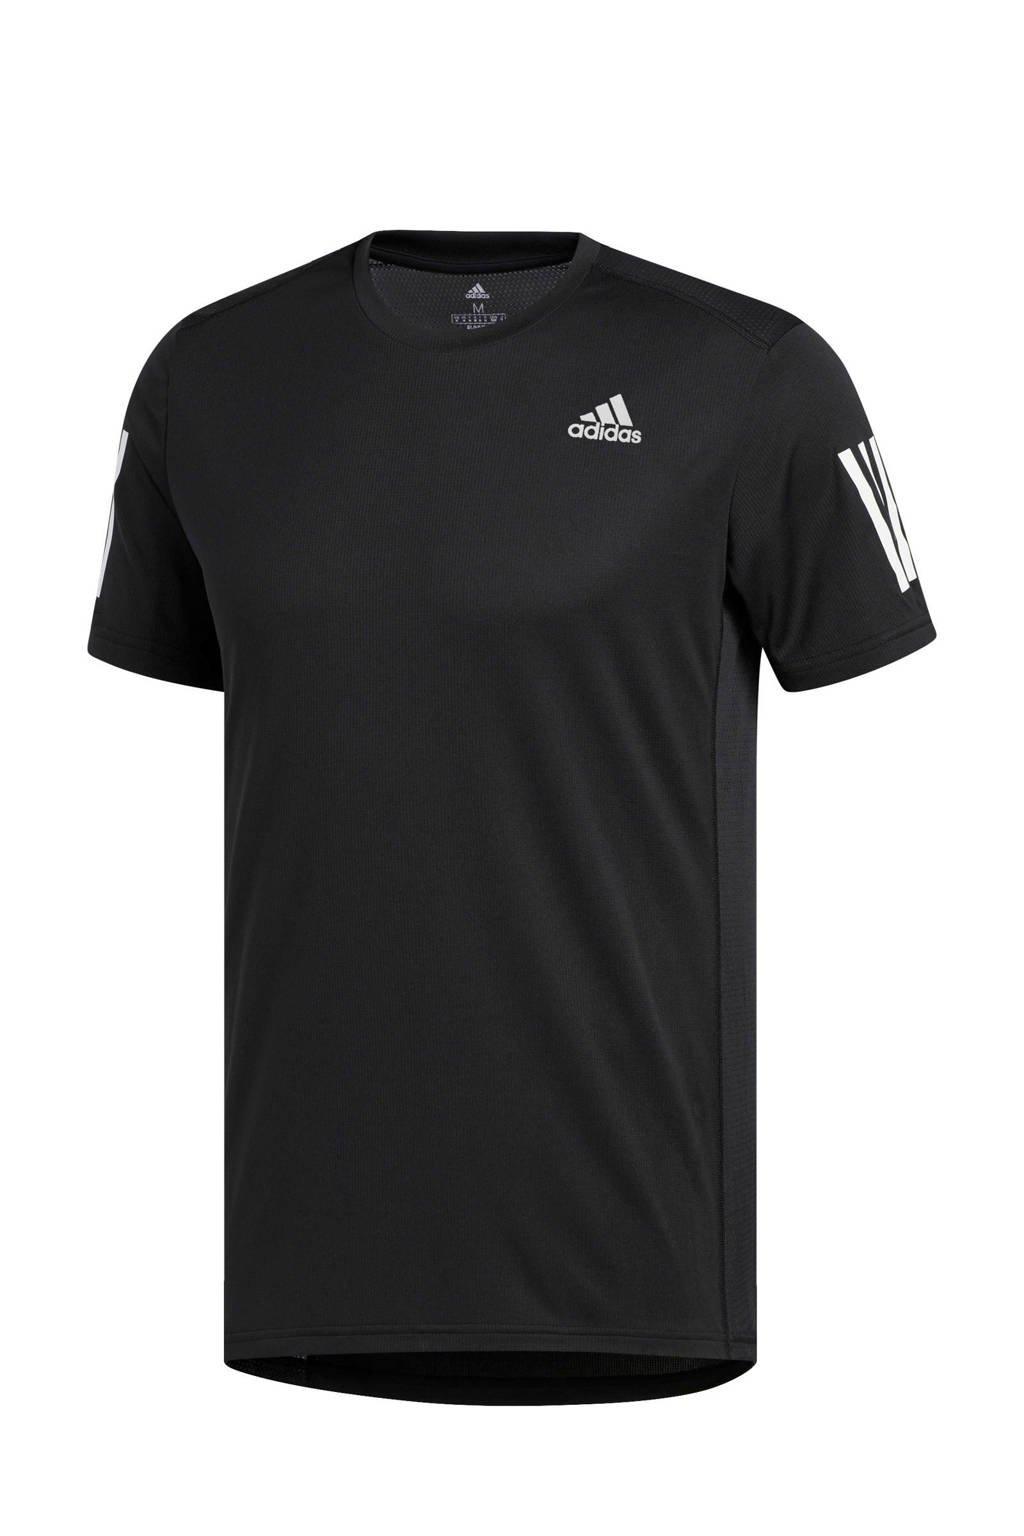 adidas   hardloop T-shirt zwart, Zwart/wit